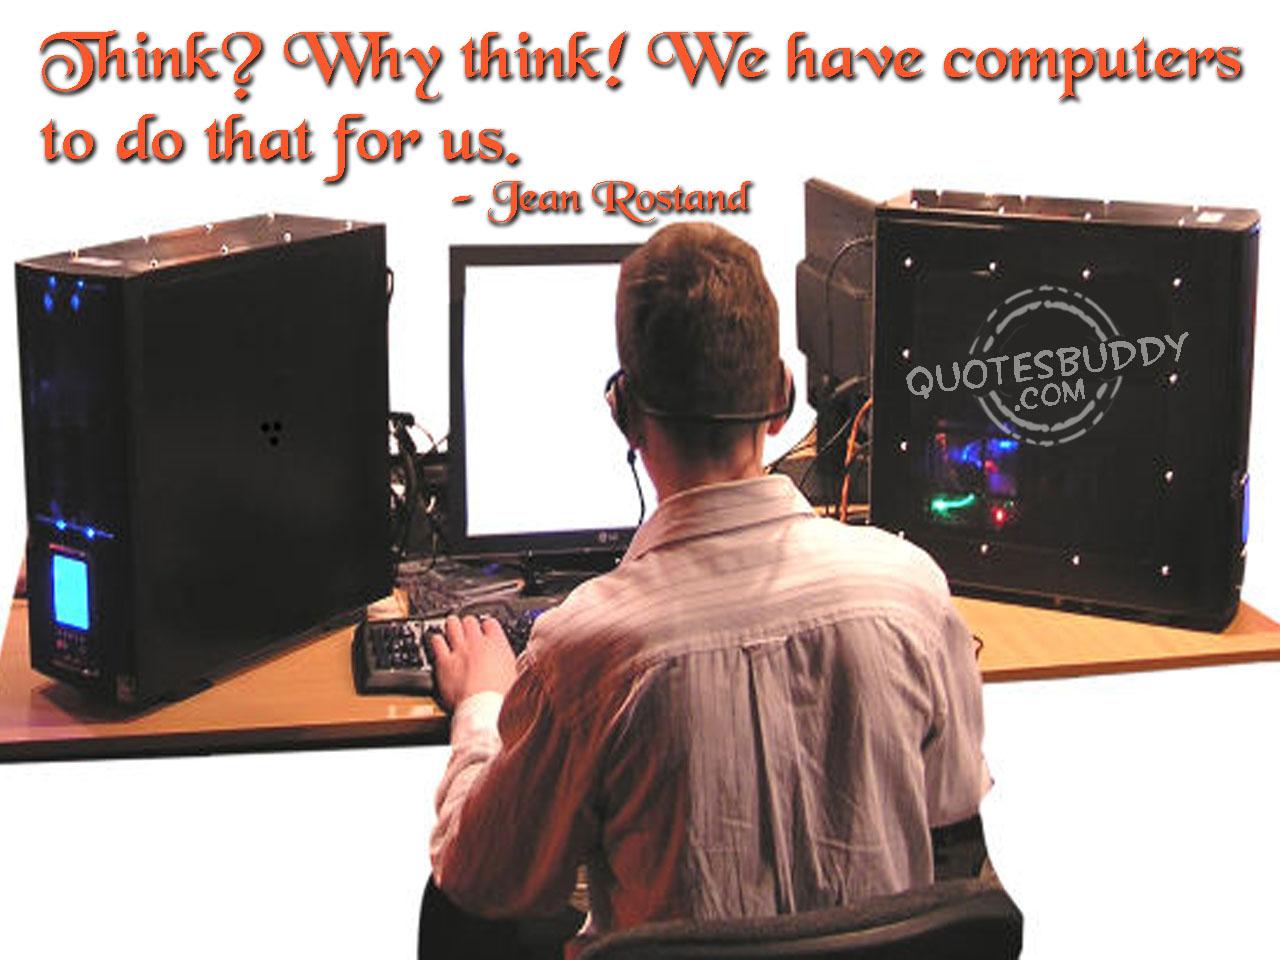 Computer Science Quotes Quotesgram: Funny Computer Quotes. QuotesGram